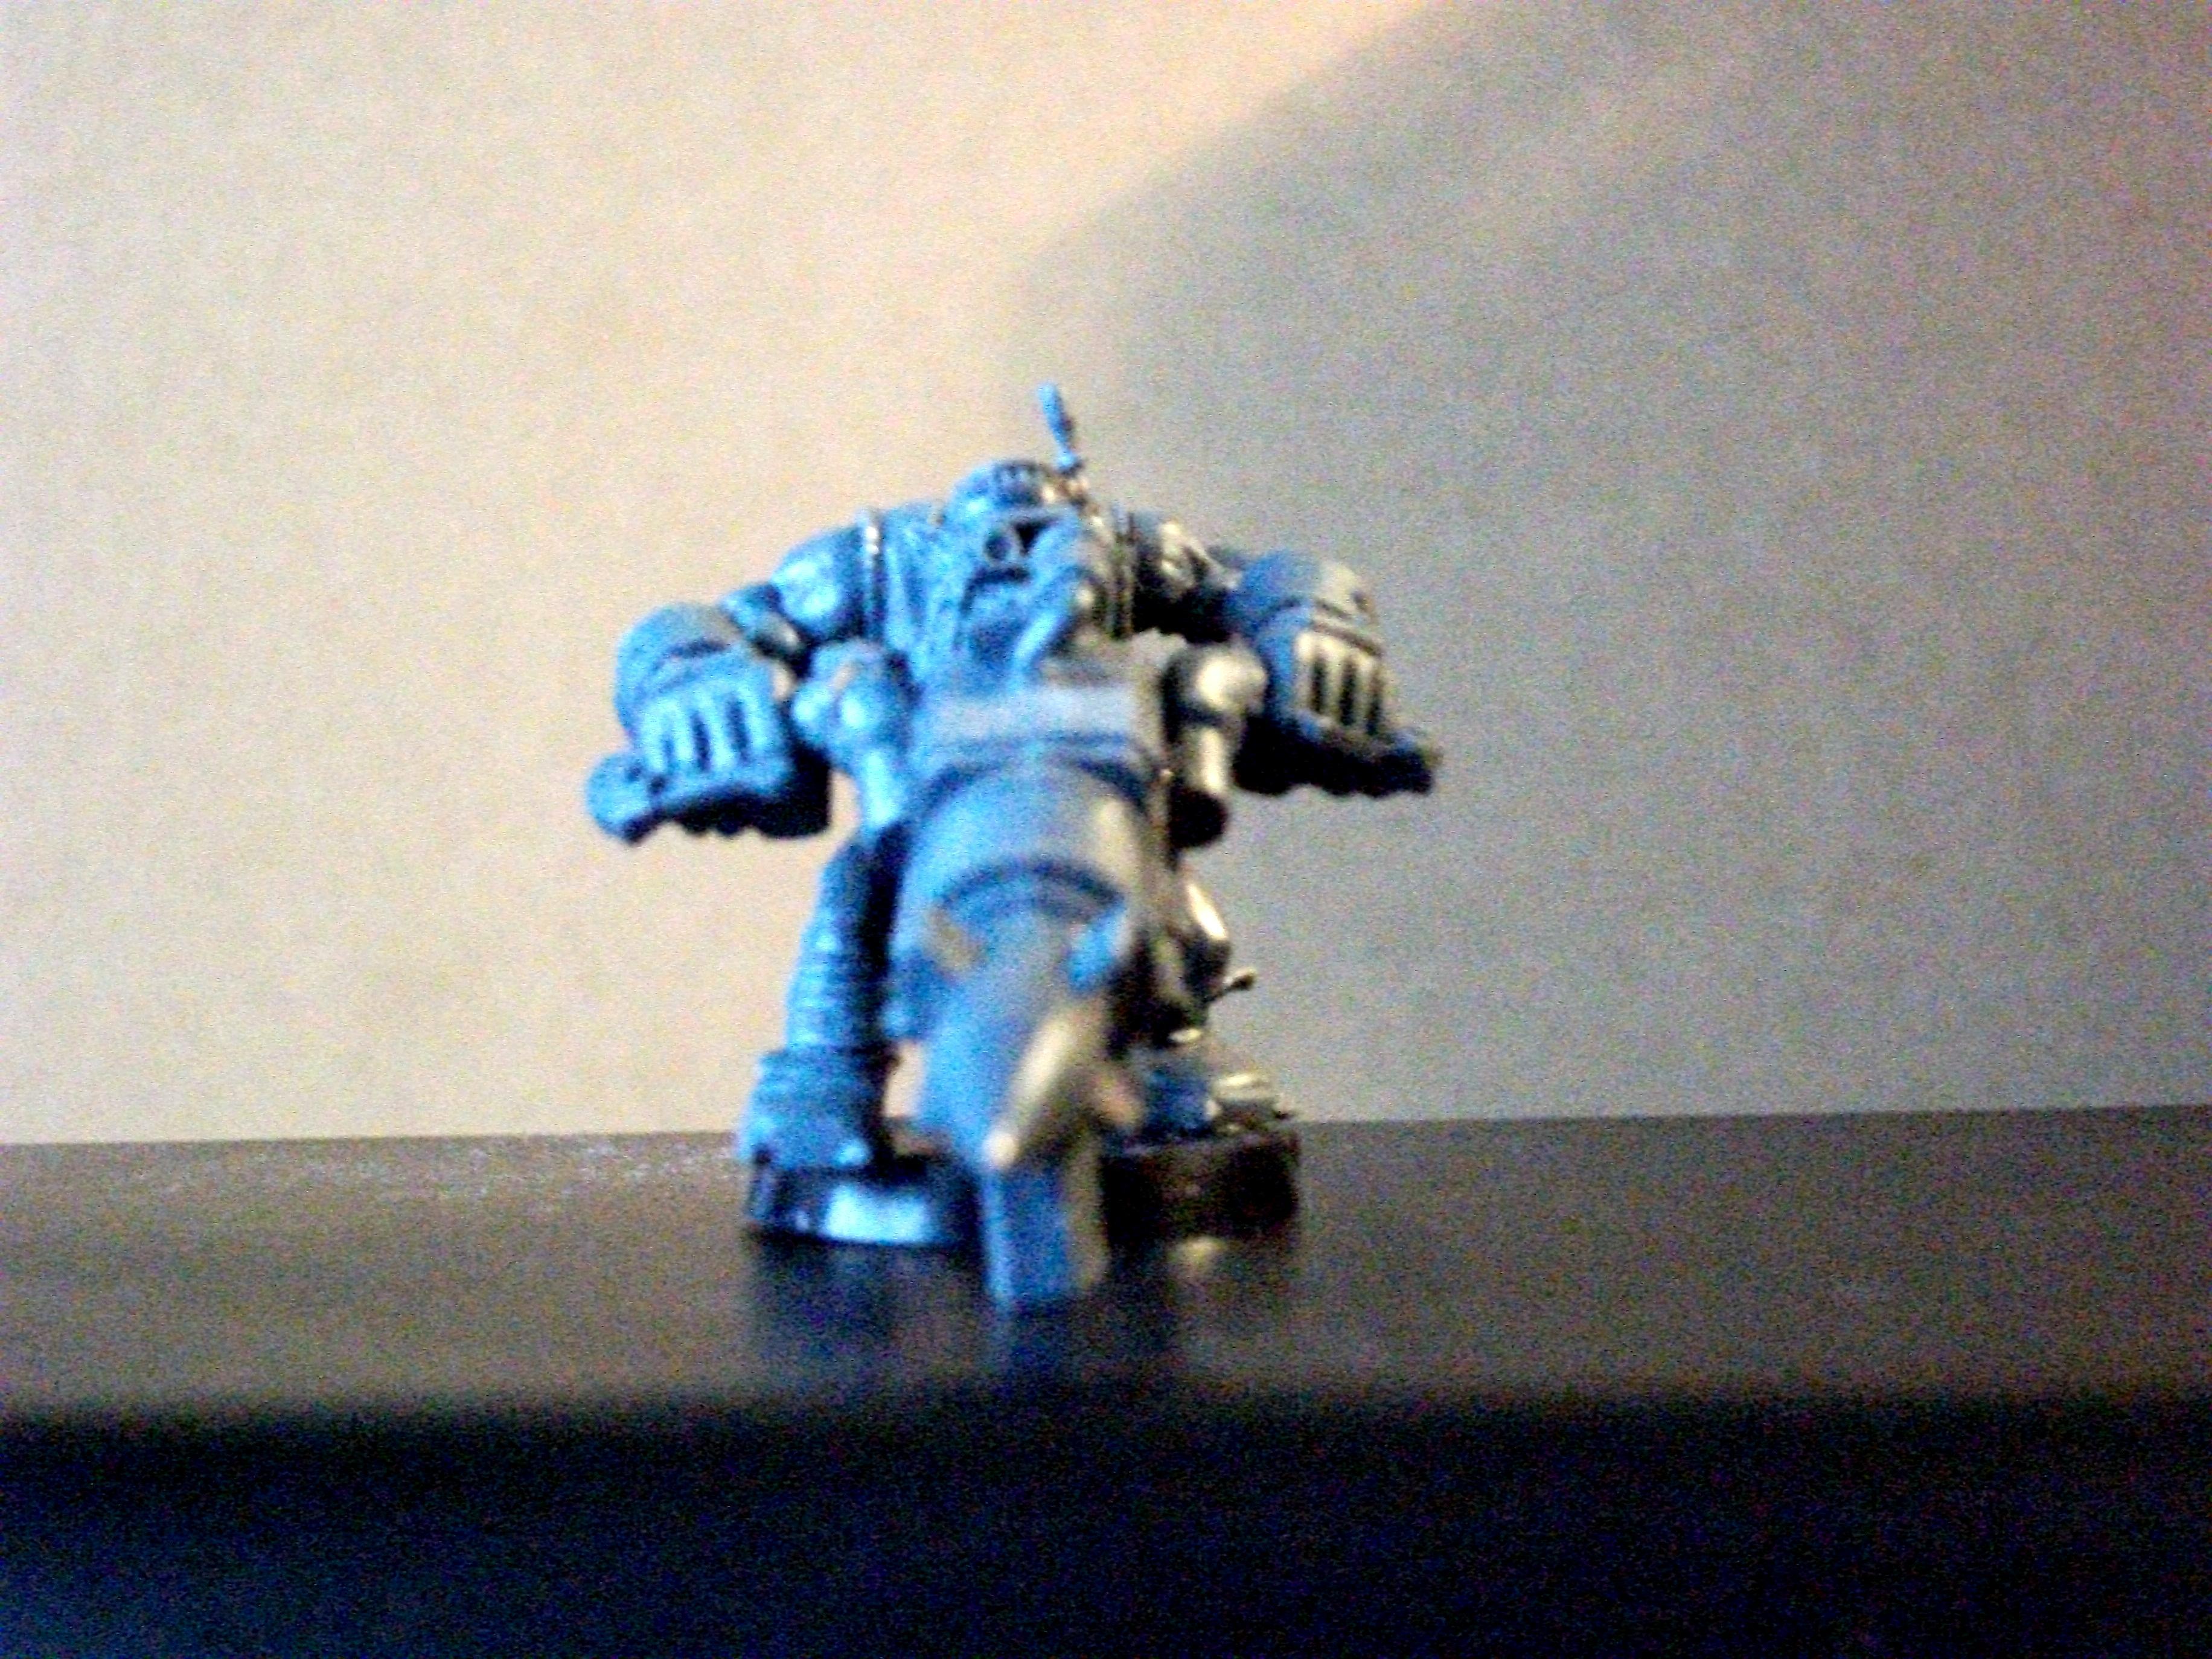 Conversion, Ork Boy, Orks, Rokkit Launcha, Warhammer 40,000